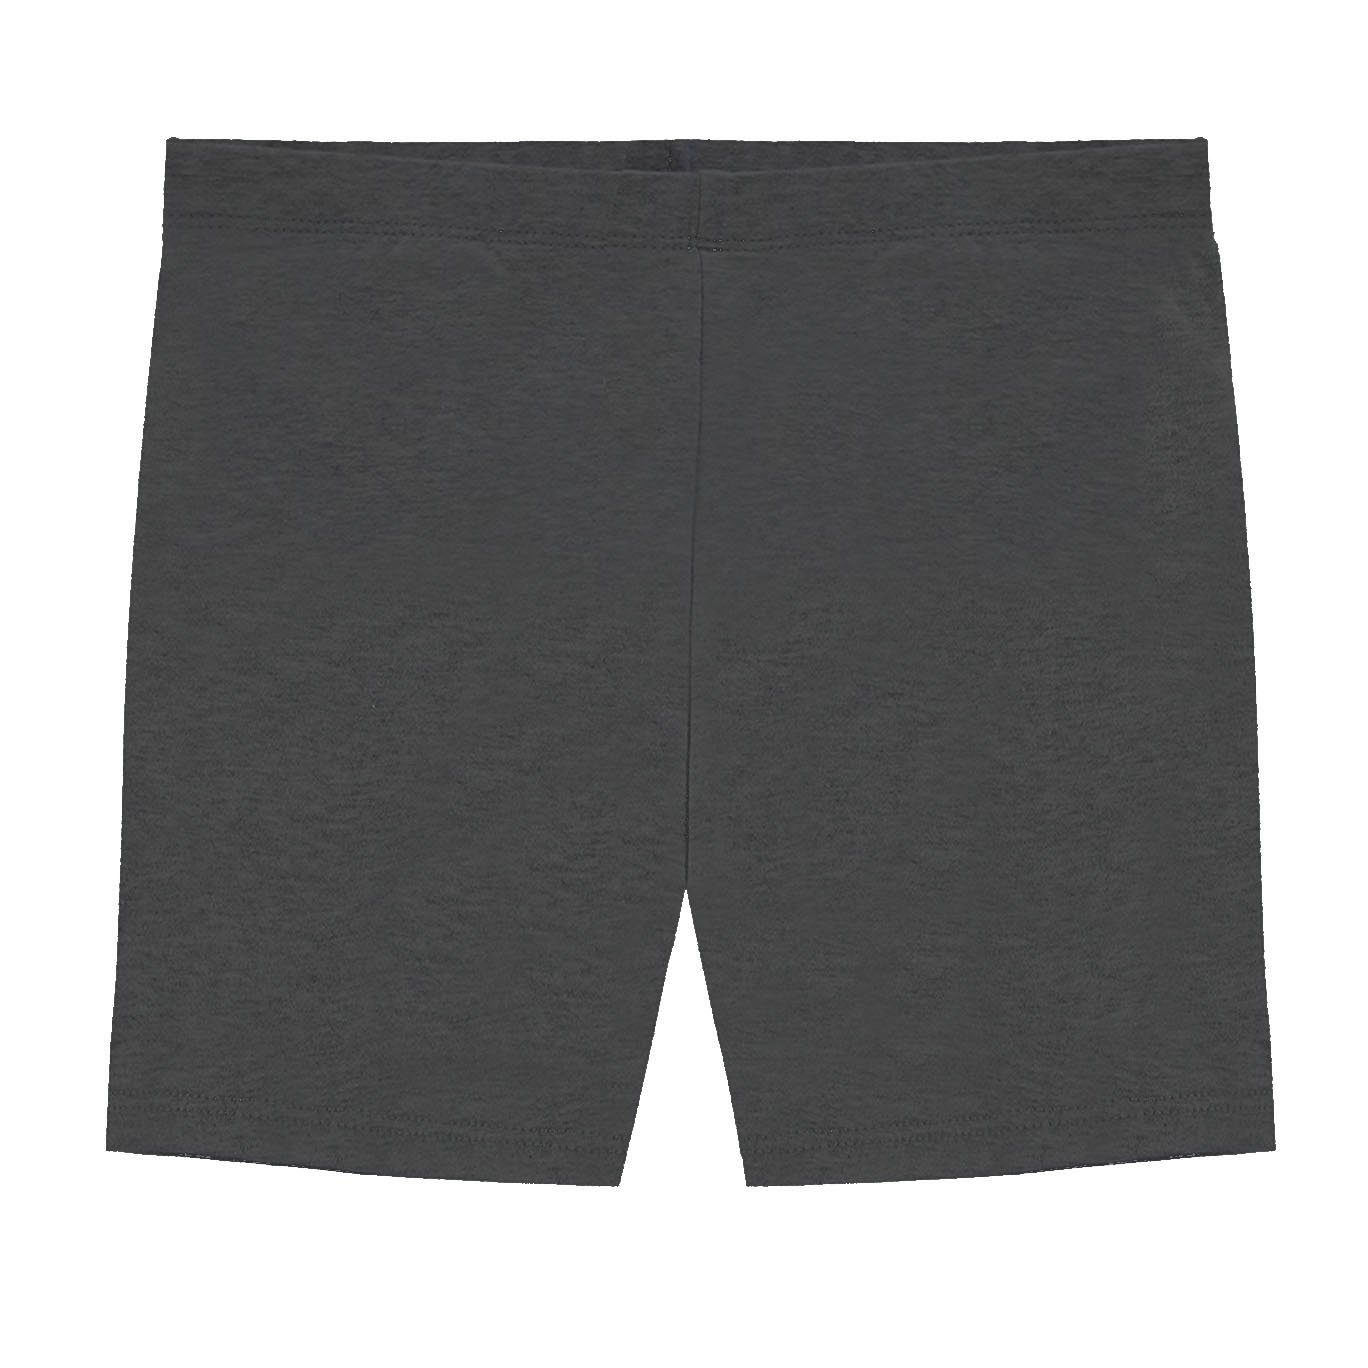 School Uniform Under Skirts Hollywood Star Fashion Khanomak Girls Cotton Bike Shorts for Sports Sizes 2T- 12 Yrs